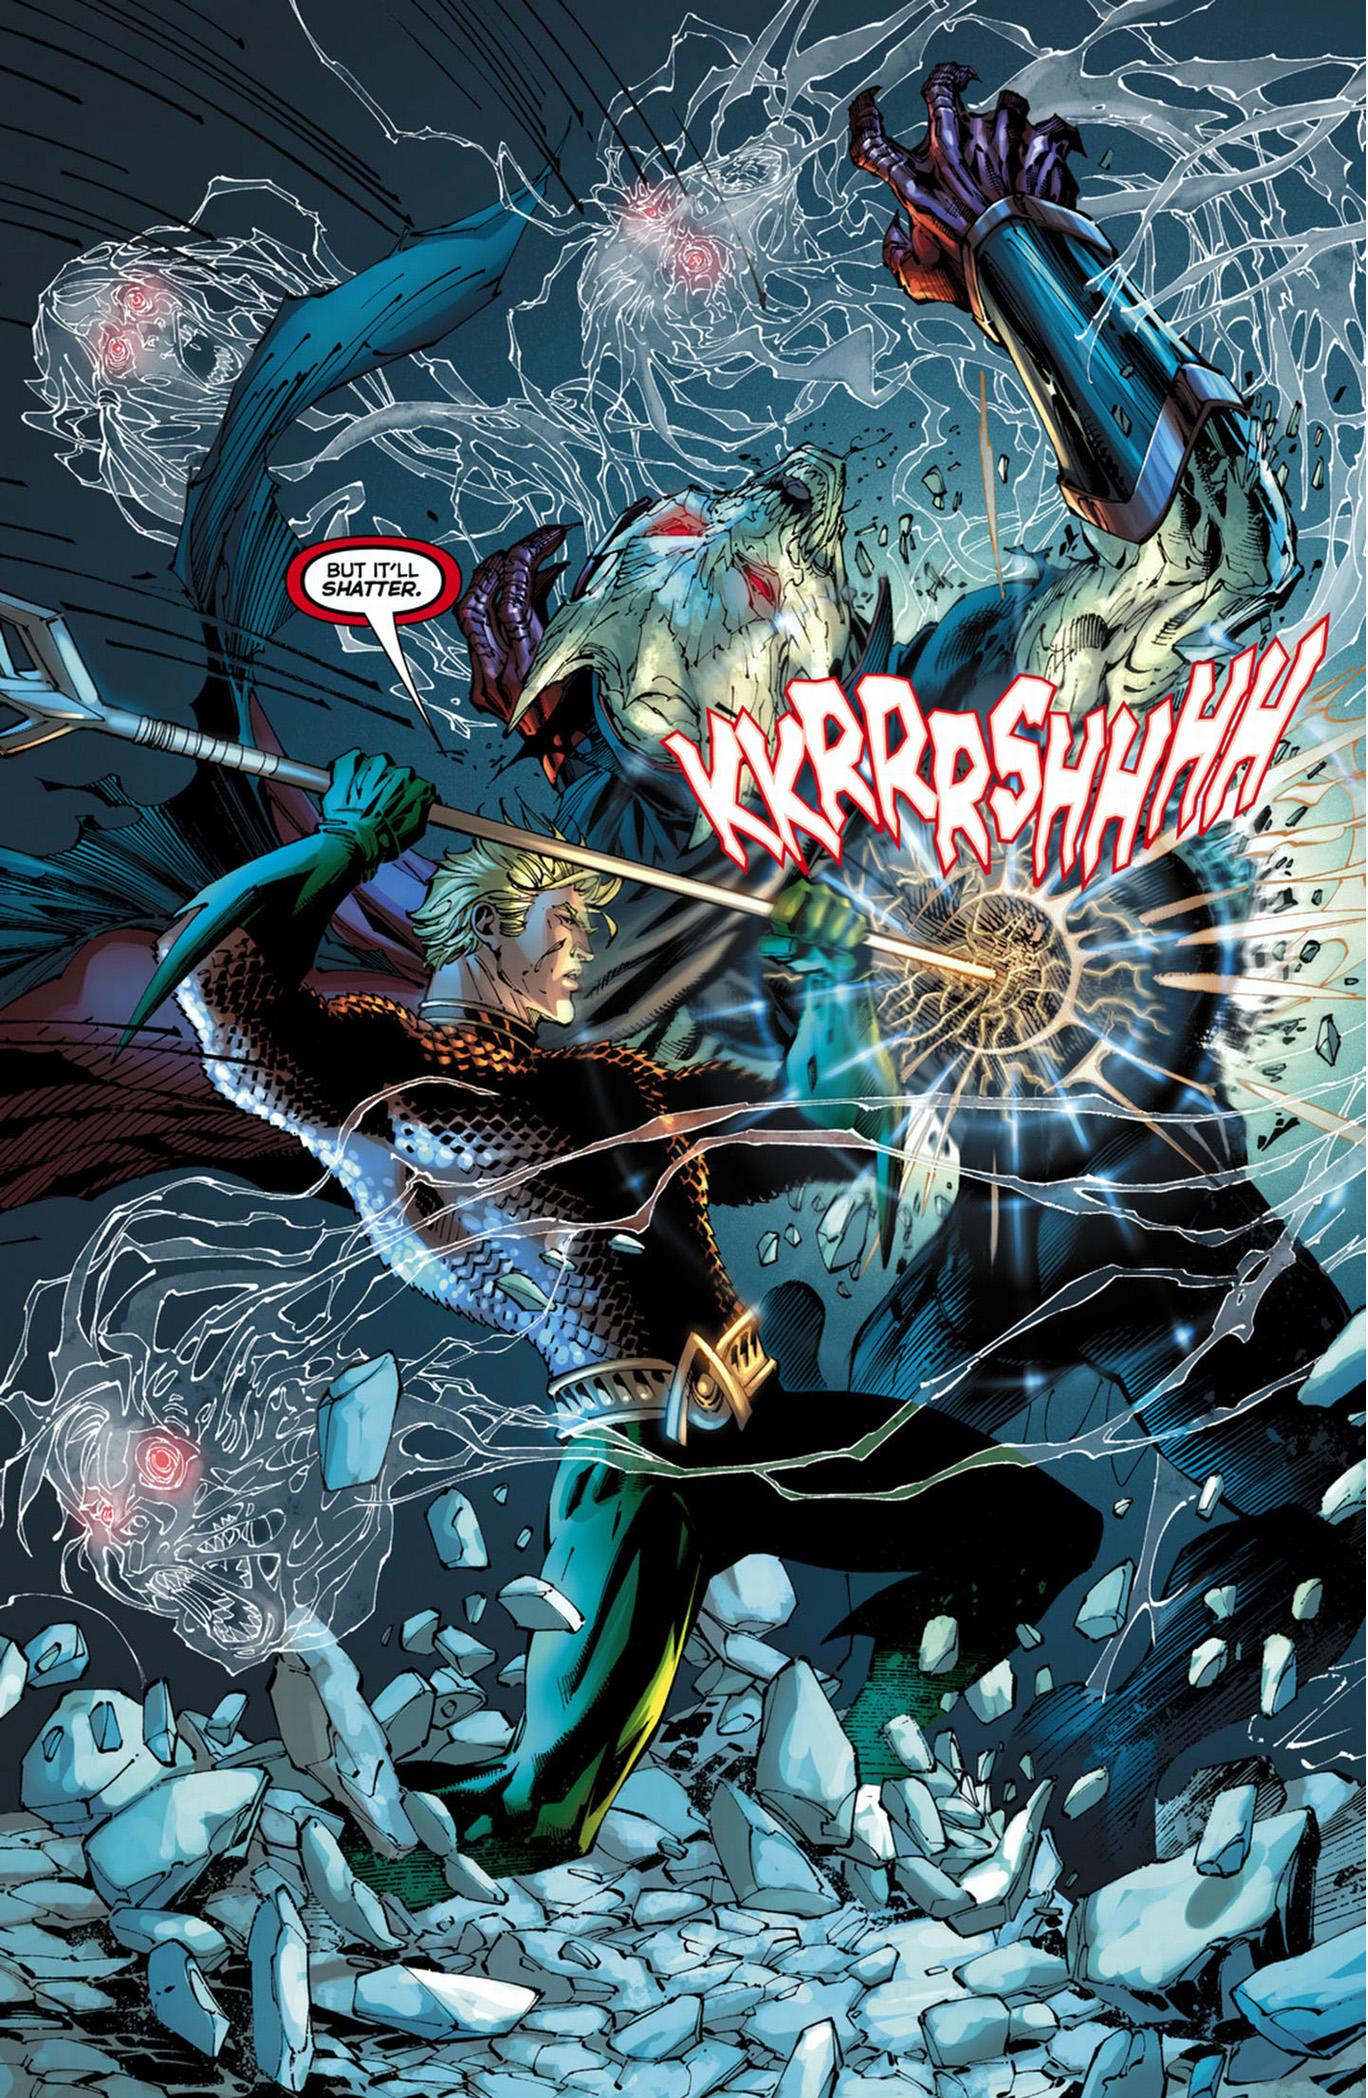 The Justice League Vs Graves Comicnewbies